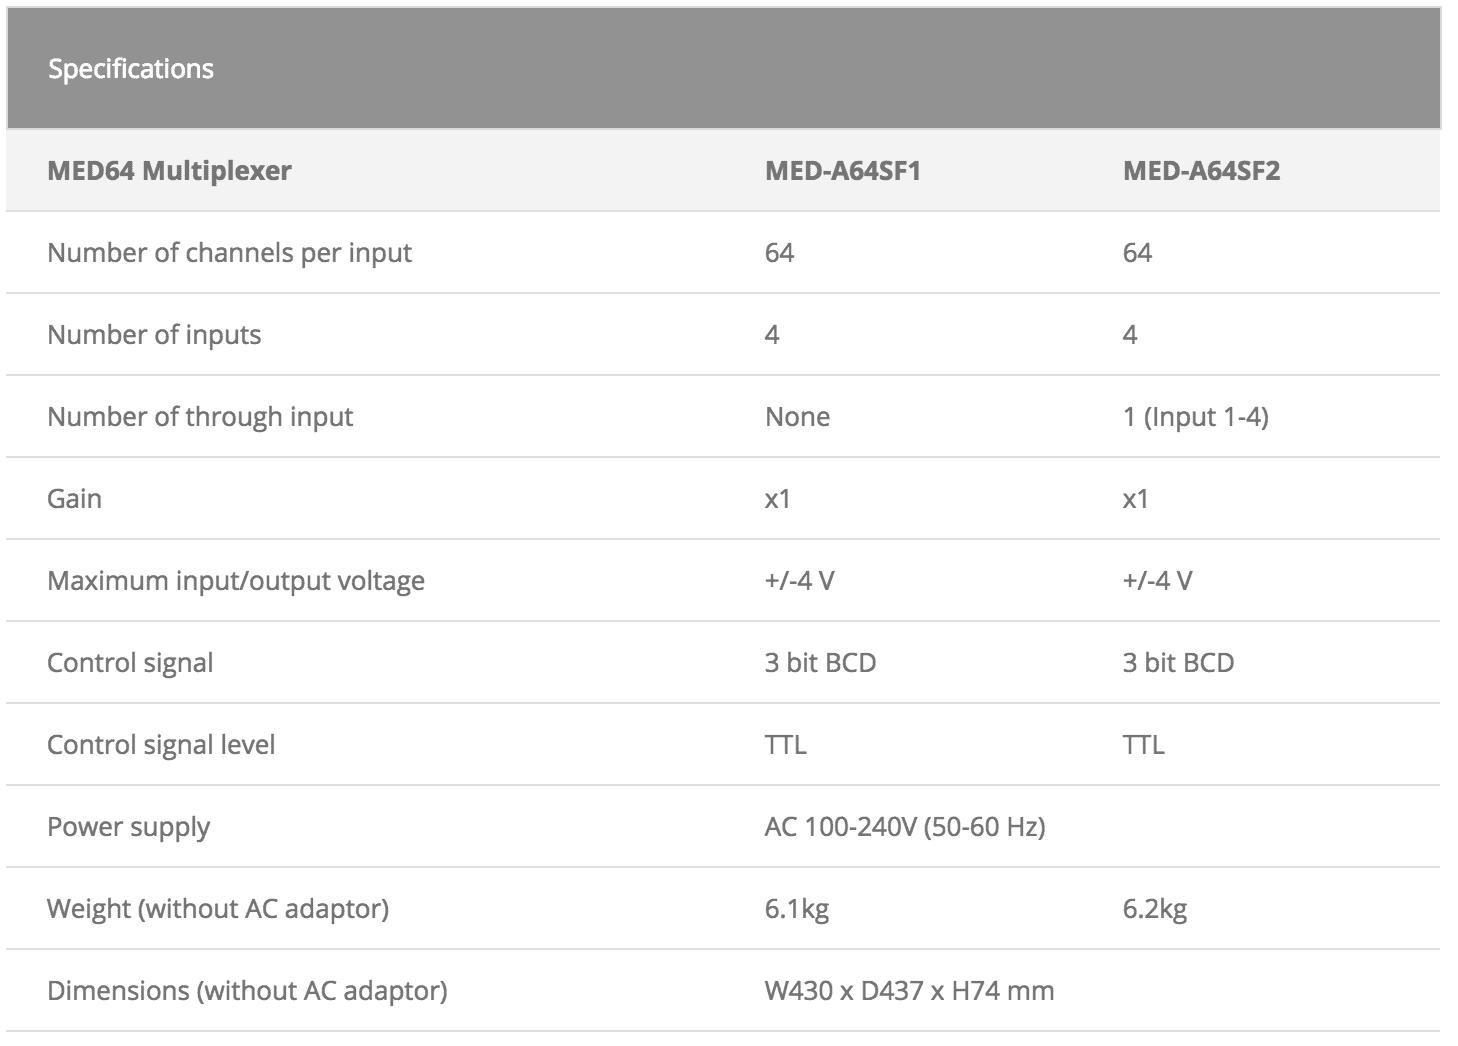 MED64 Multiplexer Specifications